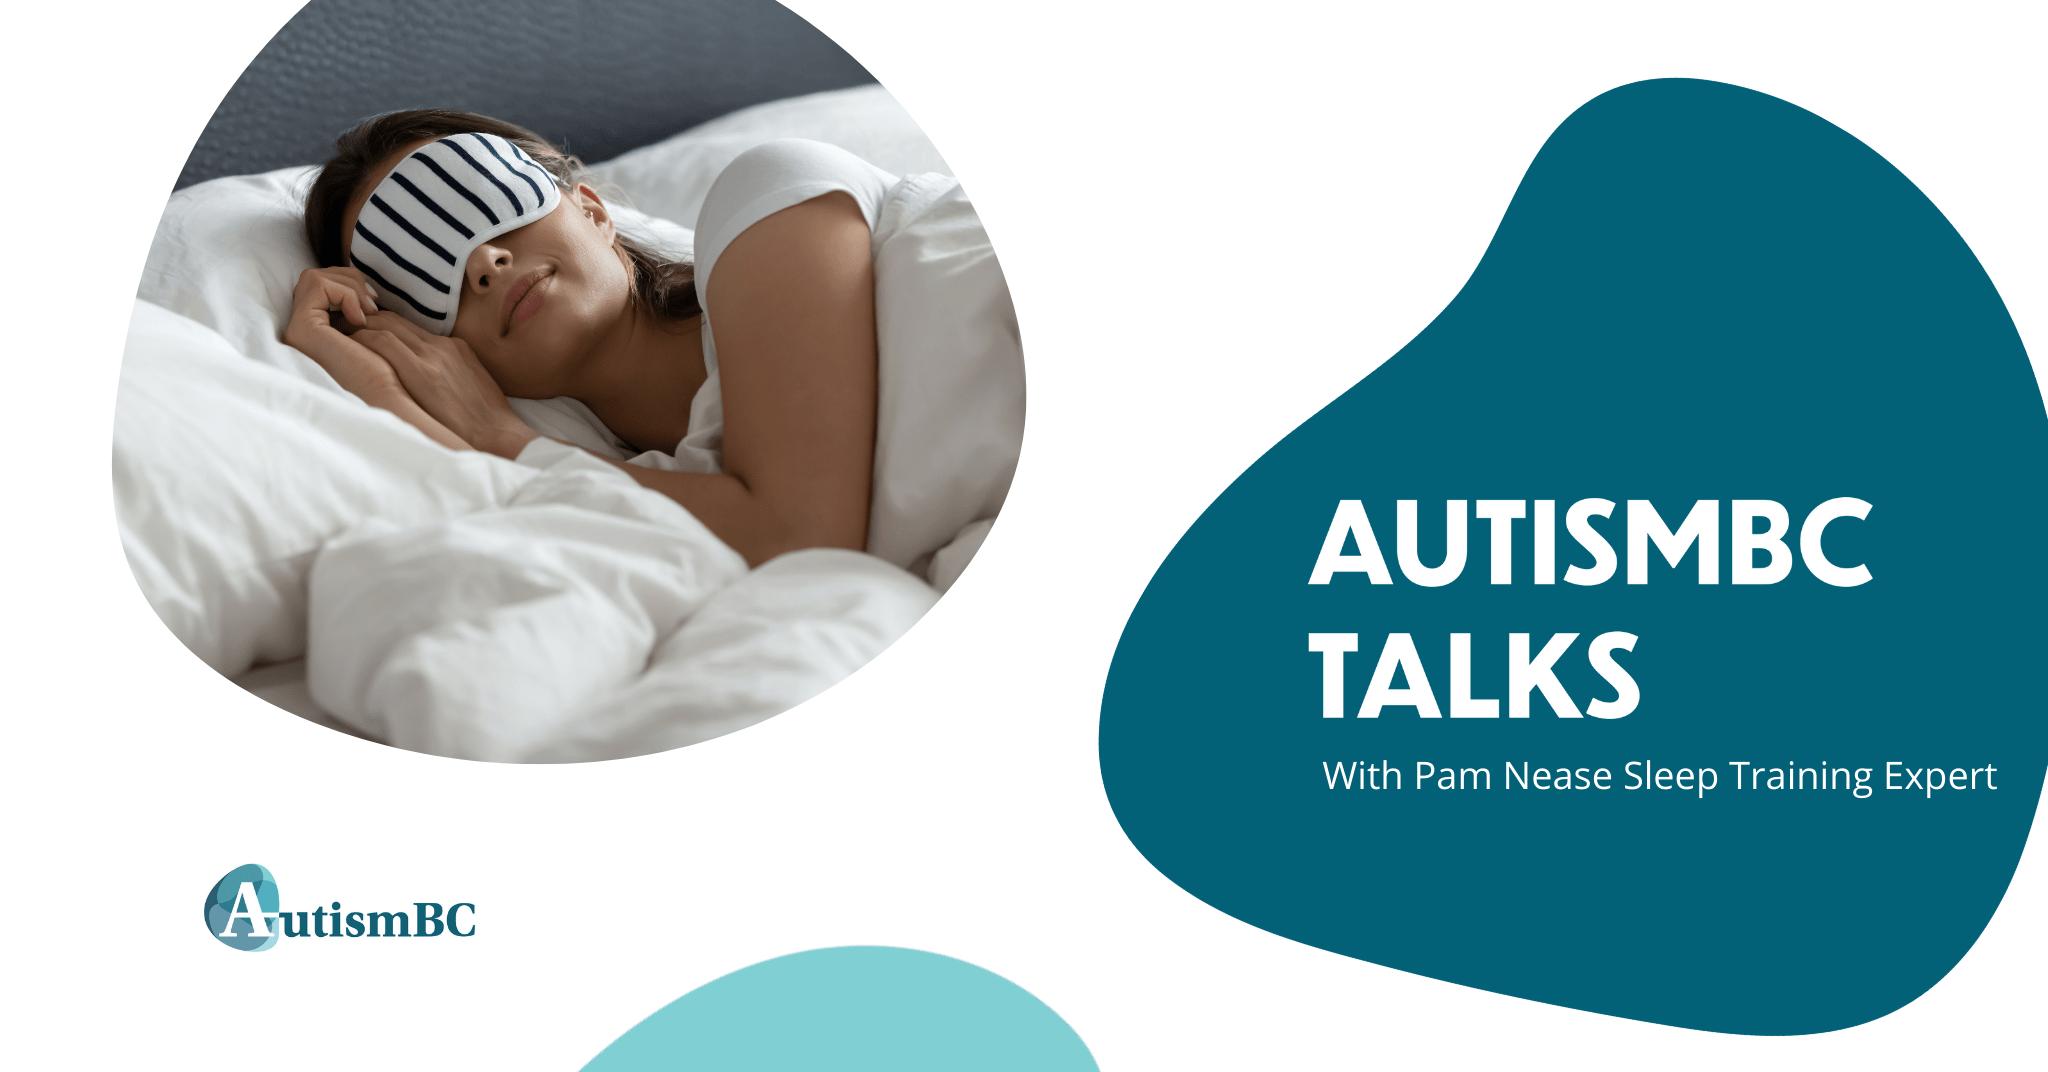 AutismBC Talks: Pam Nease Sleep Training Expert